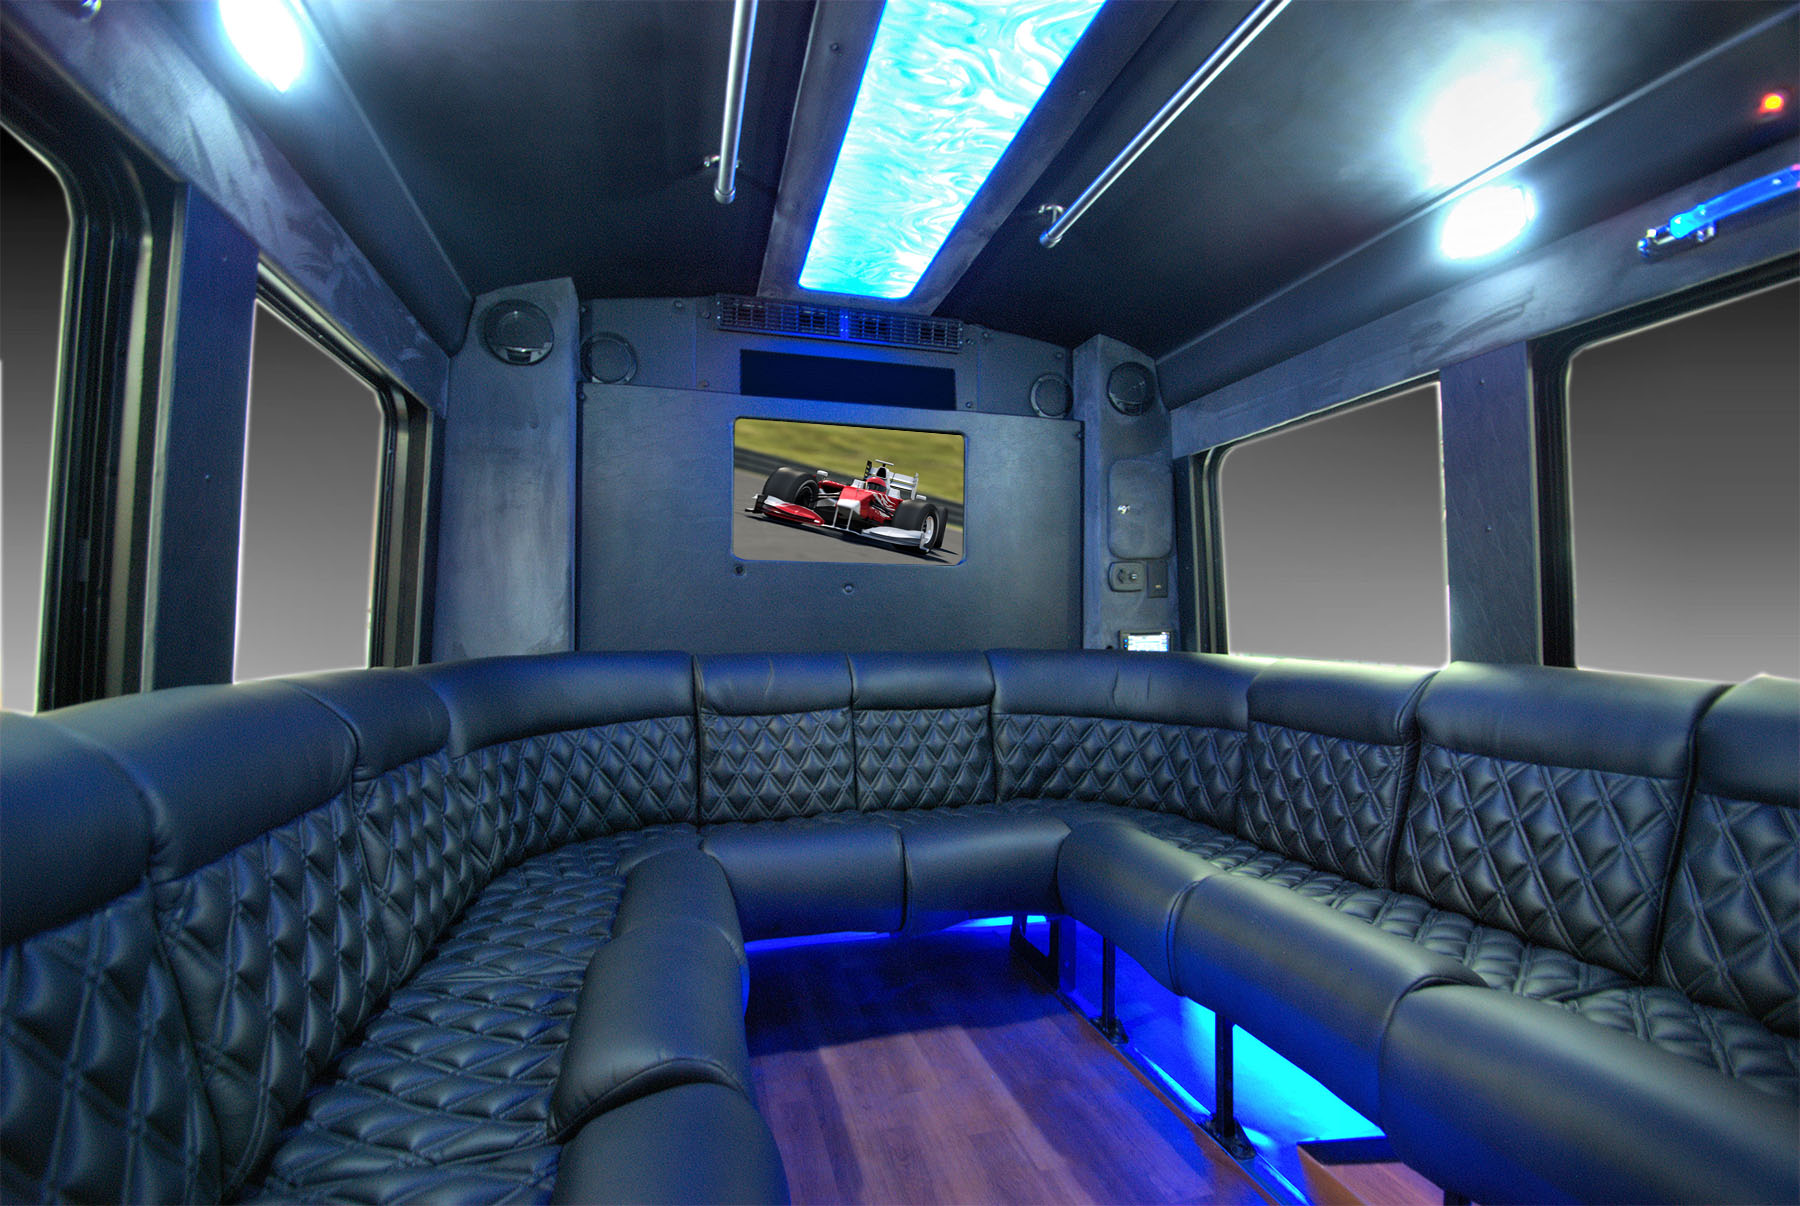 24 Passenger Limo Bus Interior 3.jpg